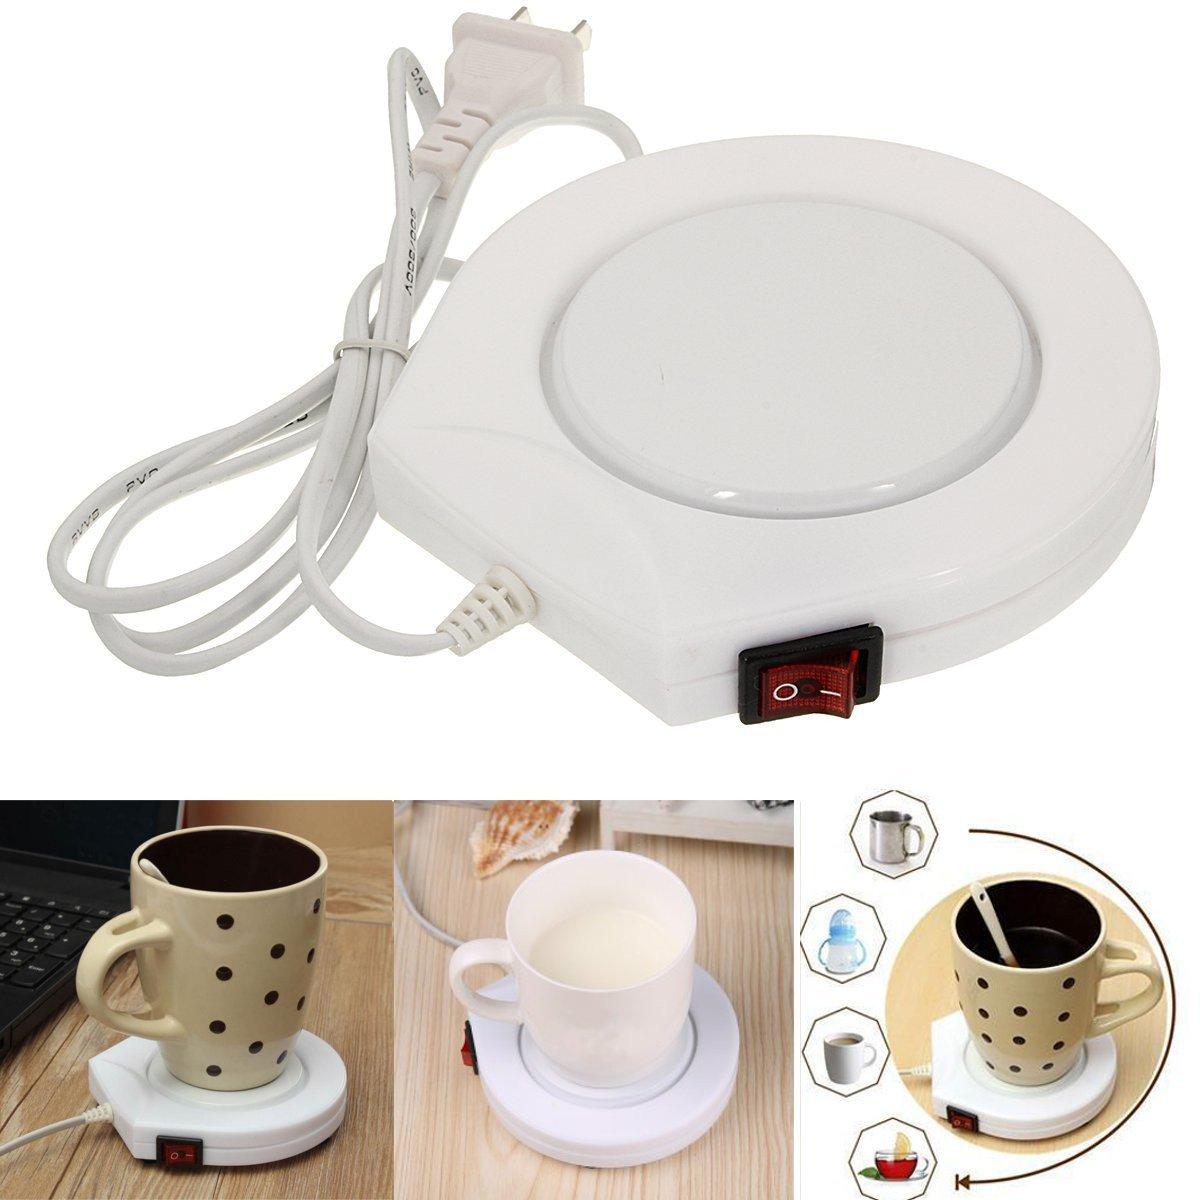 Bazaar 220v White Electric Powered Cup Warmer Heater Pad Coffee Tea Milk Mug US Plug Big Bazaar